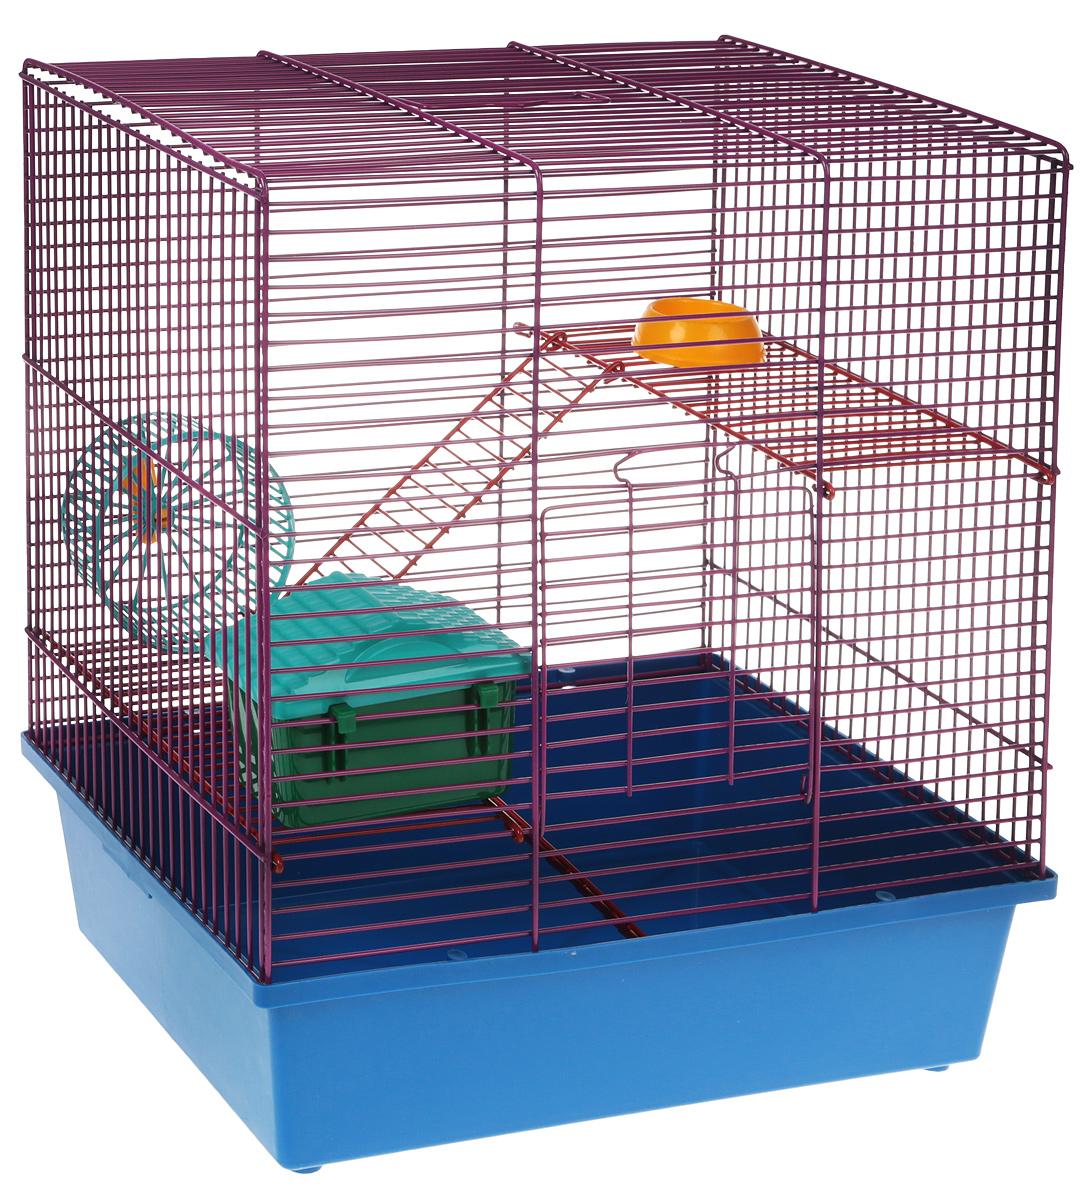 Клетка для грызунов Велес Lusy Hamster-3к, 3-этажная, цвет: синий, фиолетовый, 35 х 26 х 40 см клетка для грызунов велес с полками цвет серый 40 х 58 х 45 см